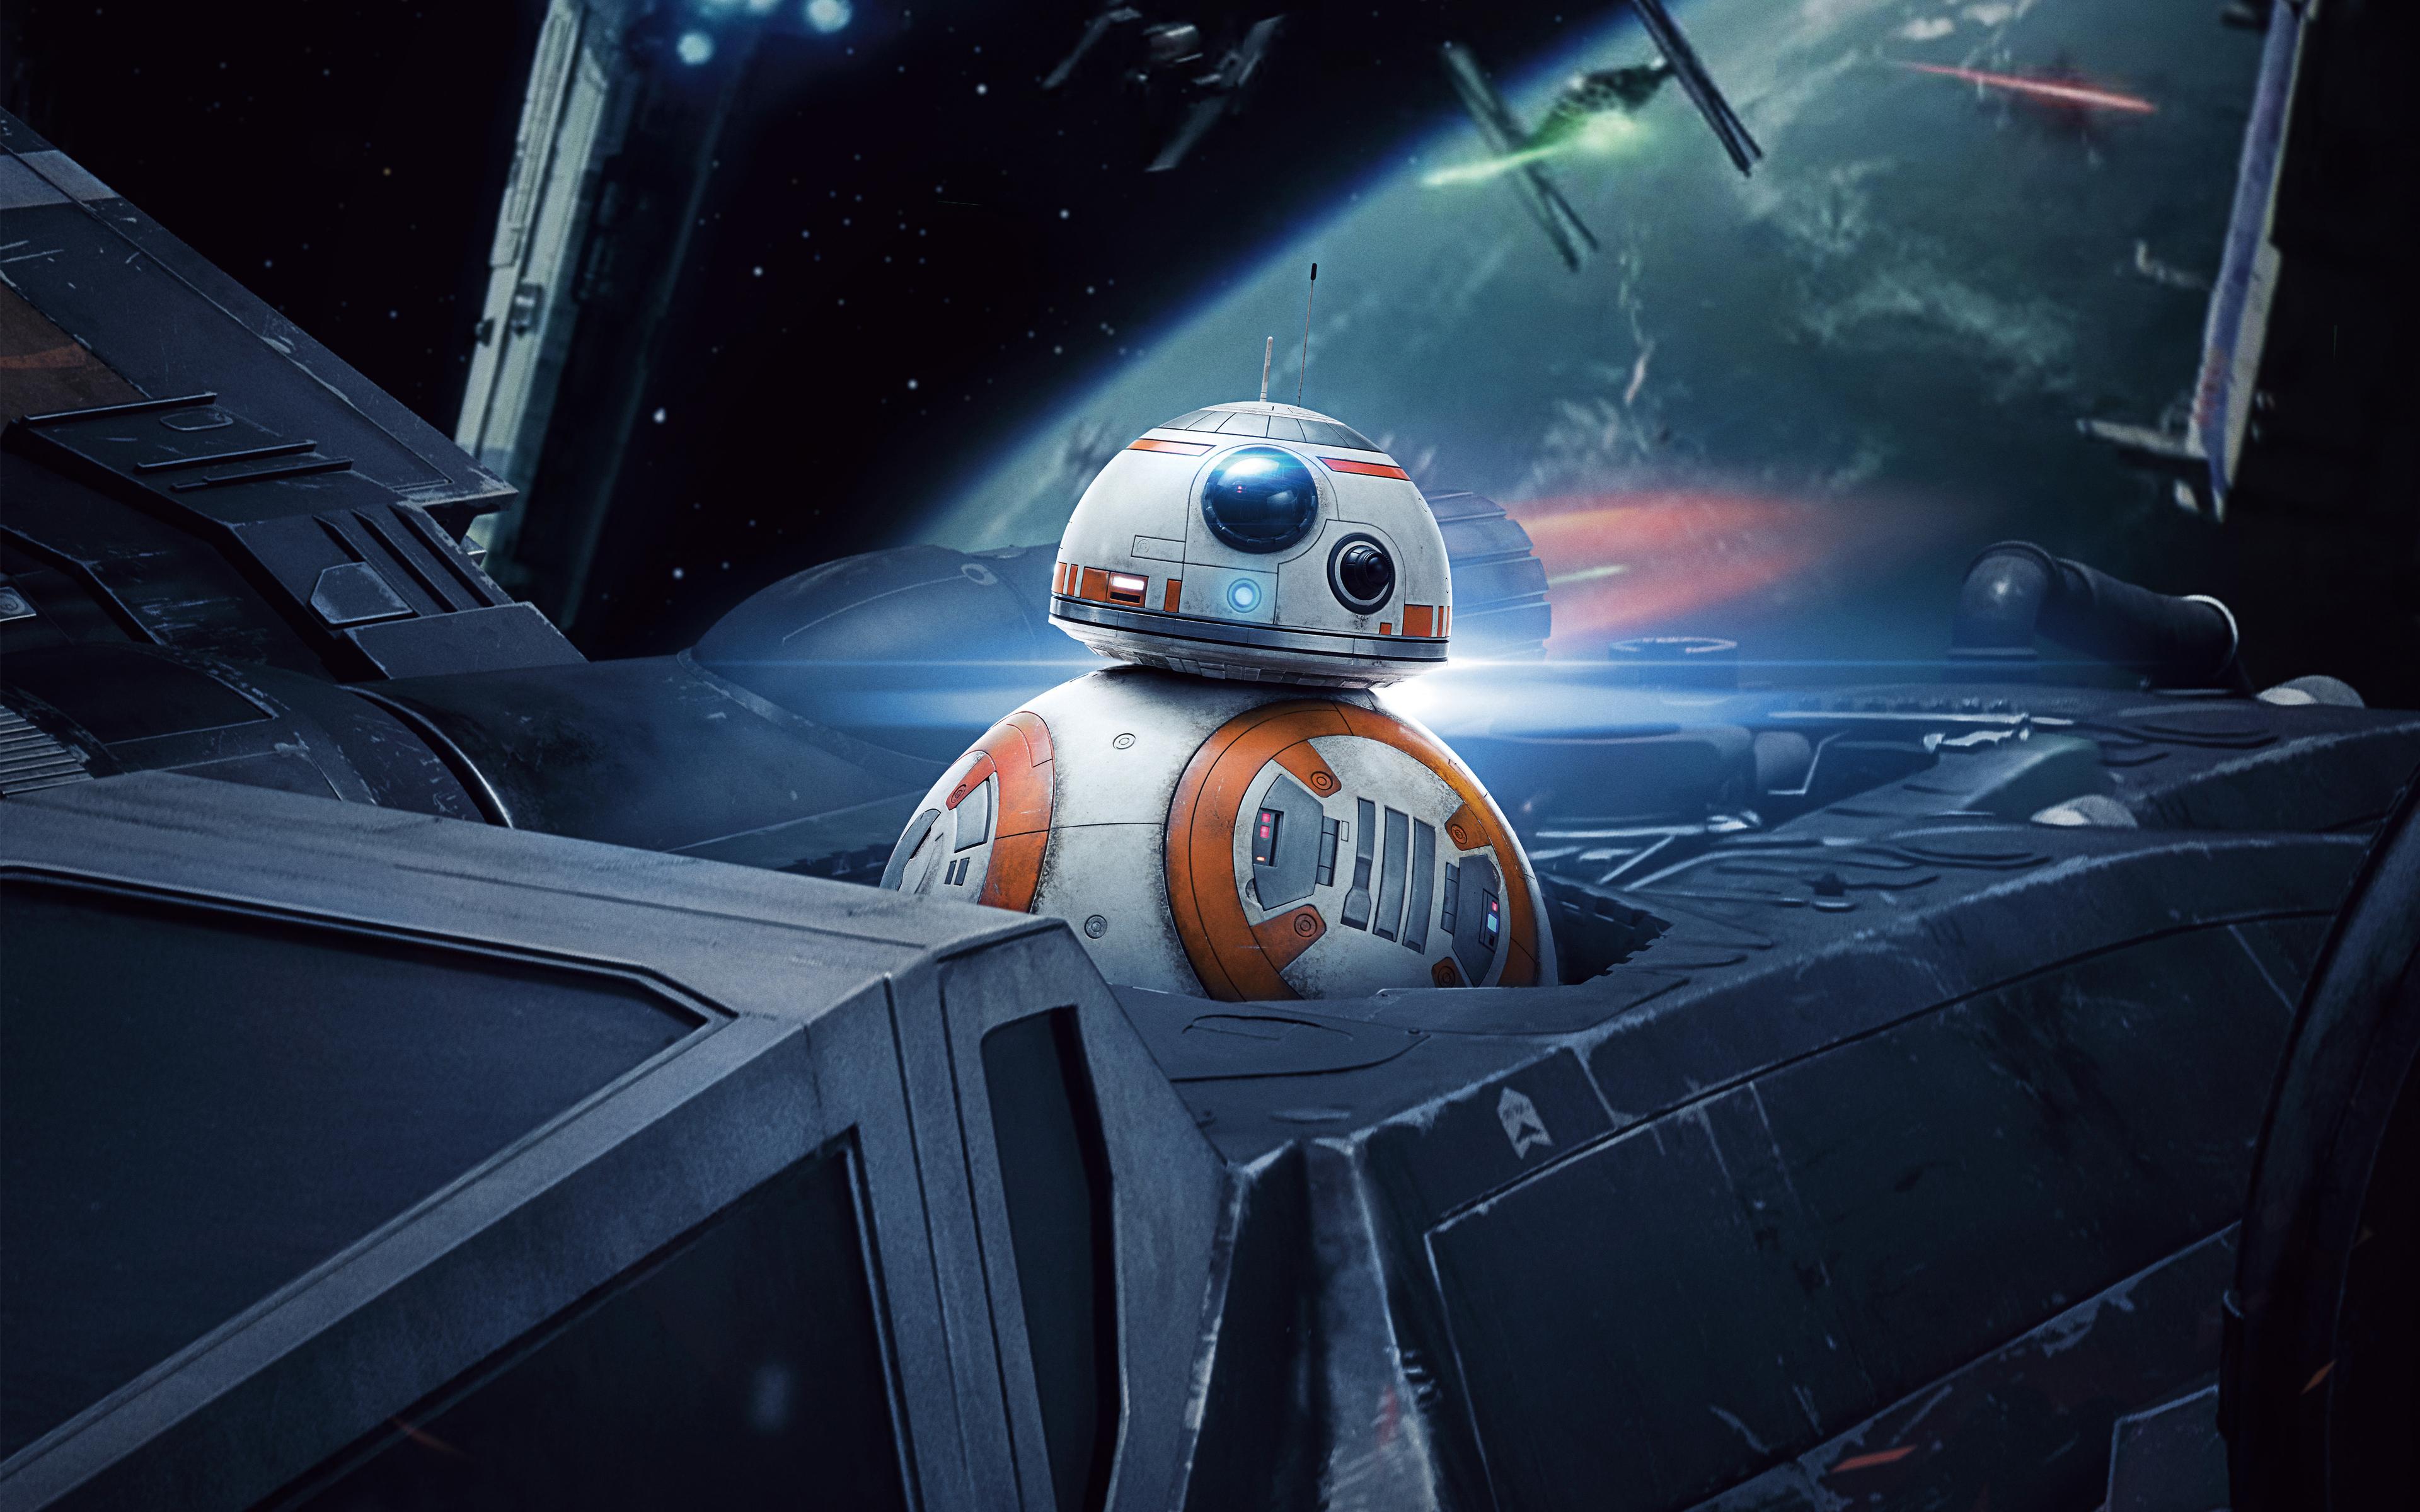 Wallpaper 4k Bb 8 In Star Wars The Last Jedi 4k Ferdinand Jedi